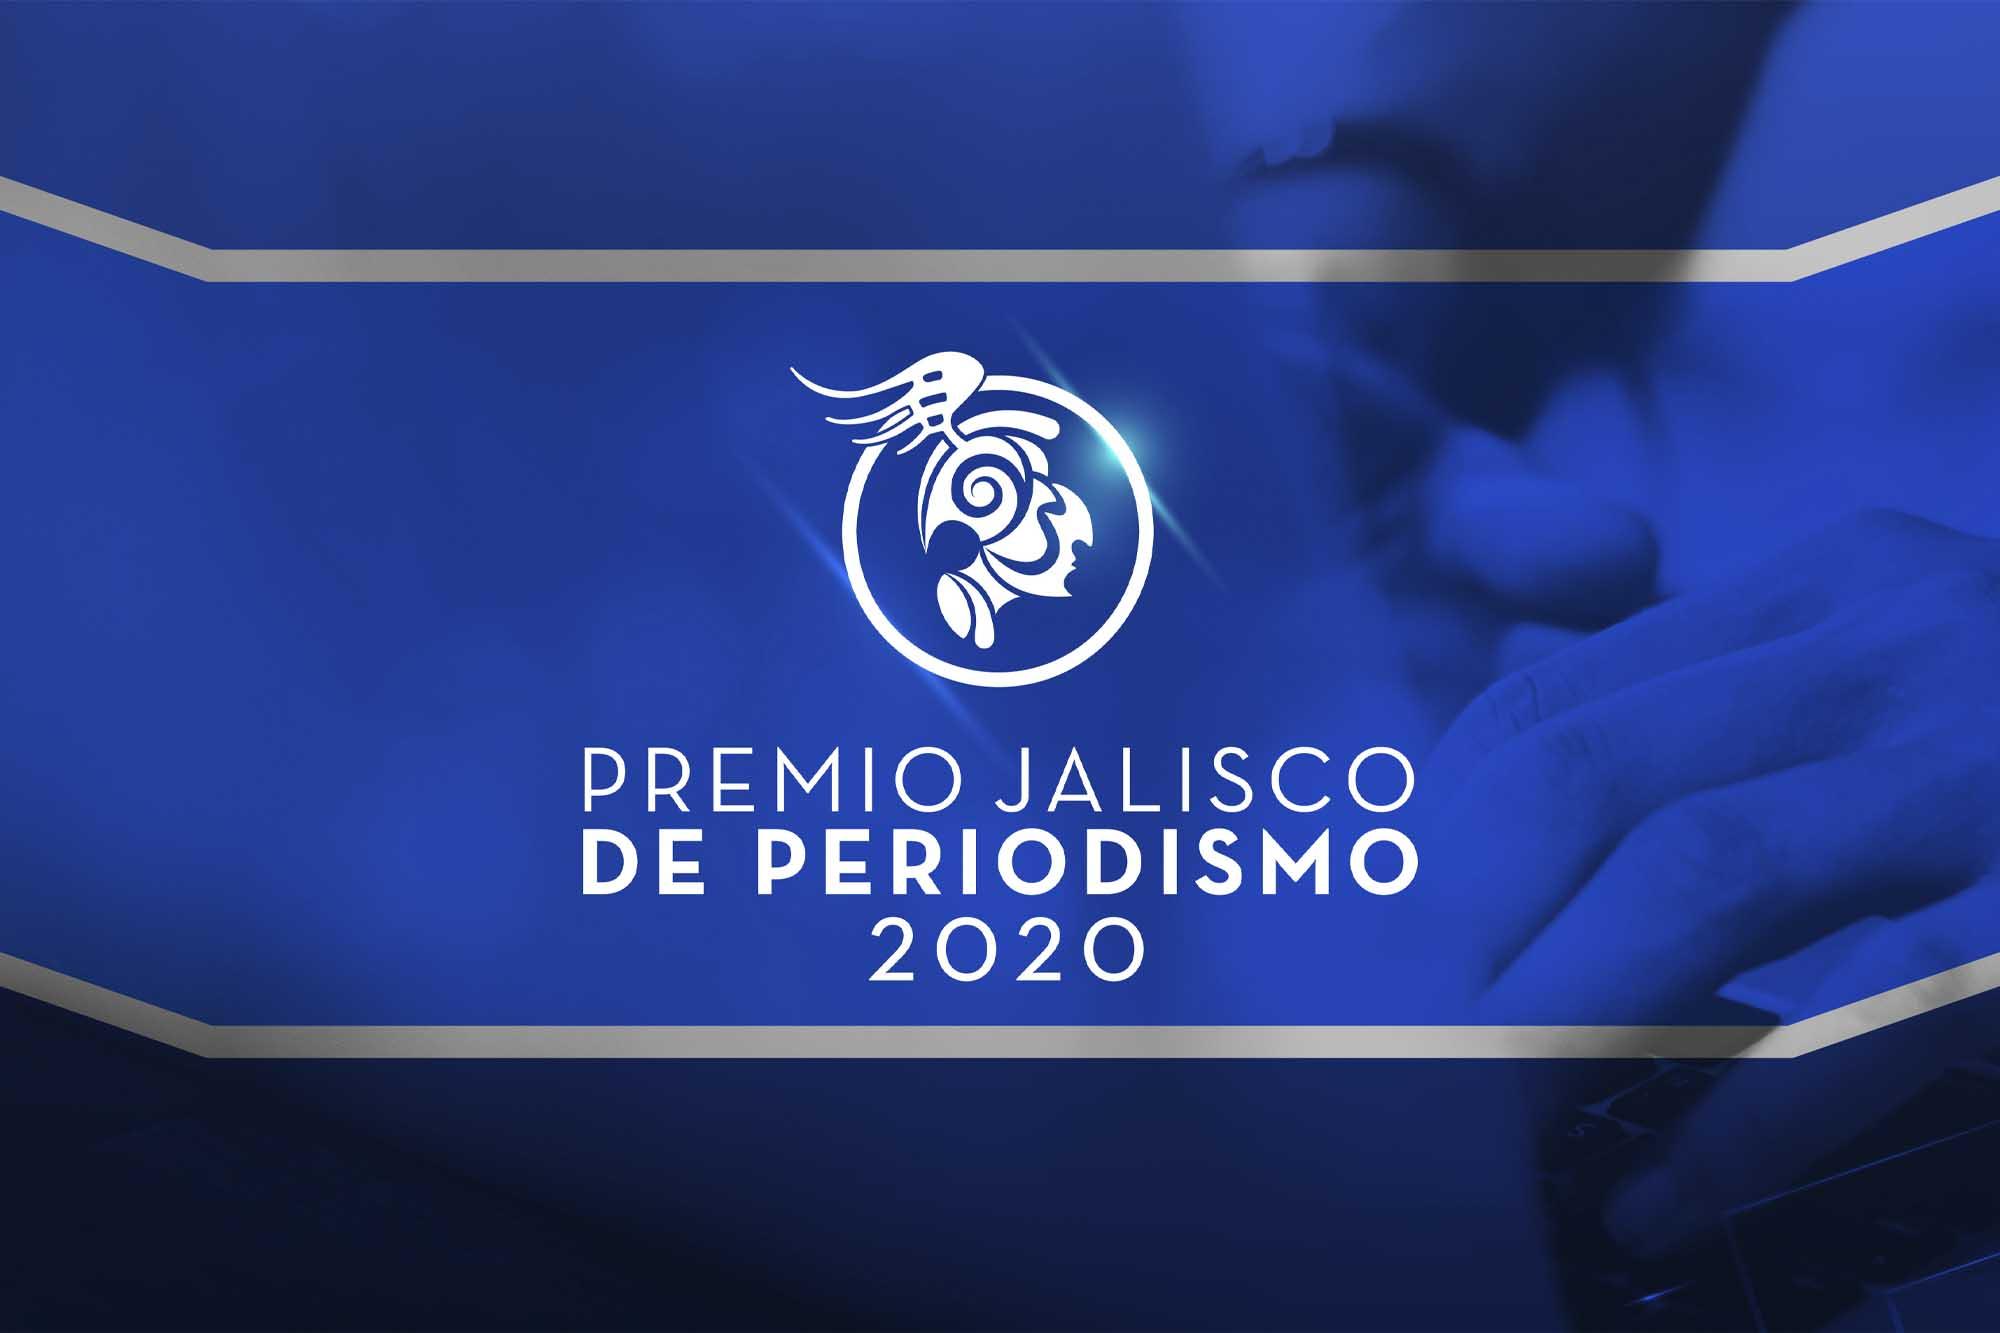 Premio Jalisco de Periodismo 021220